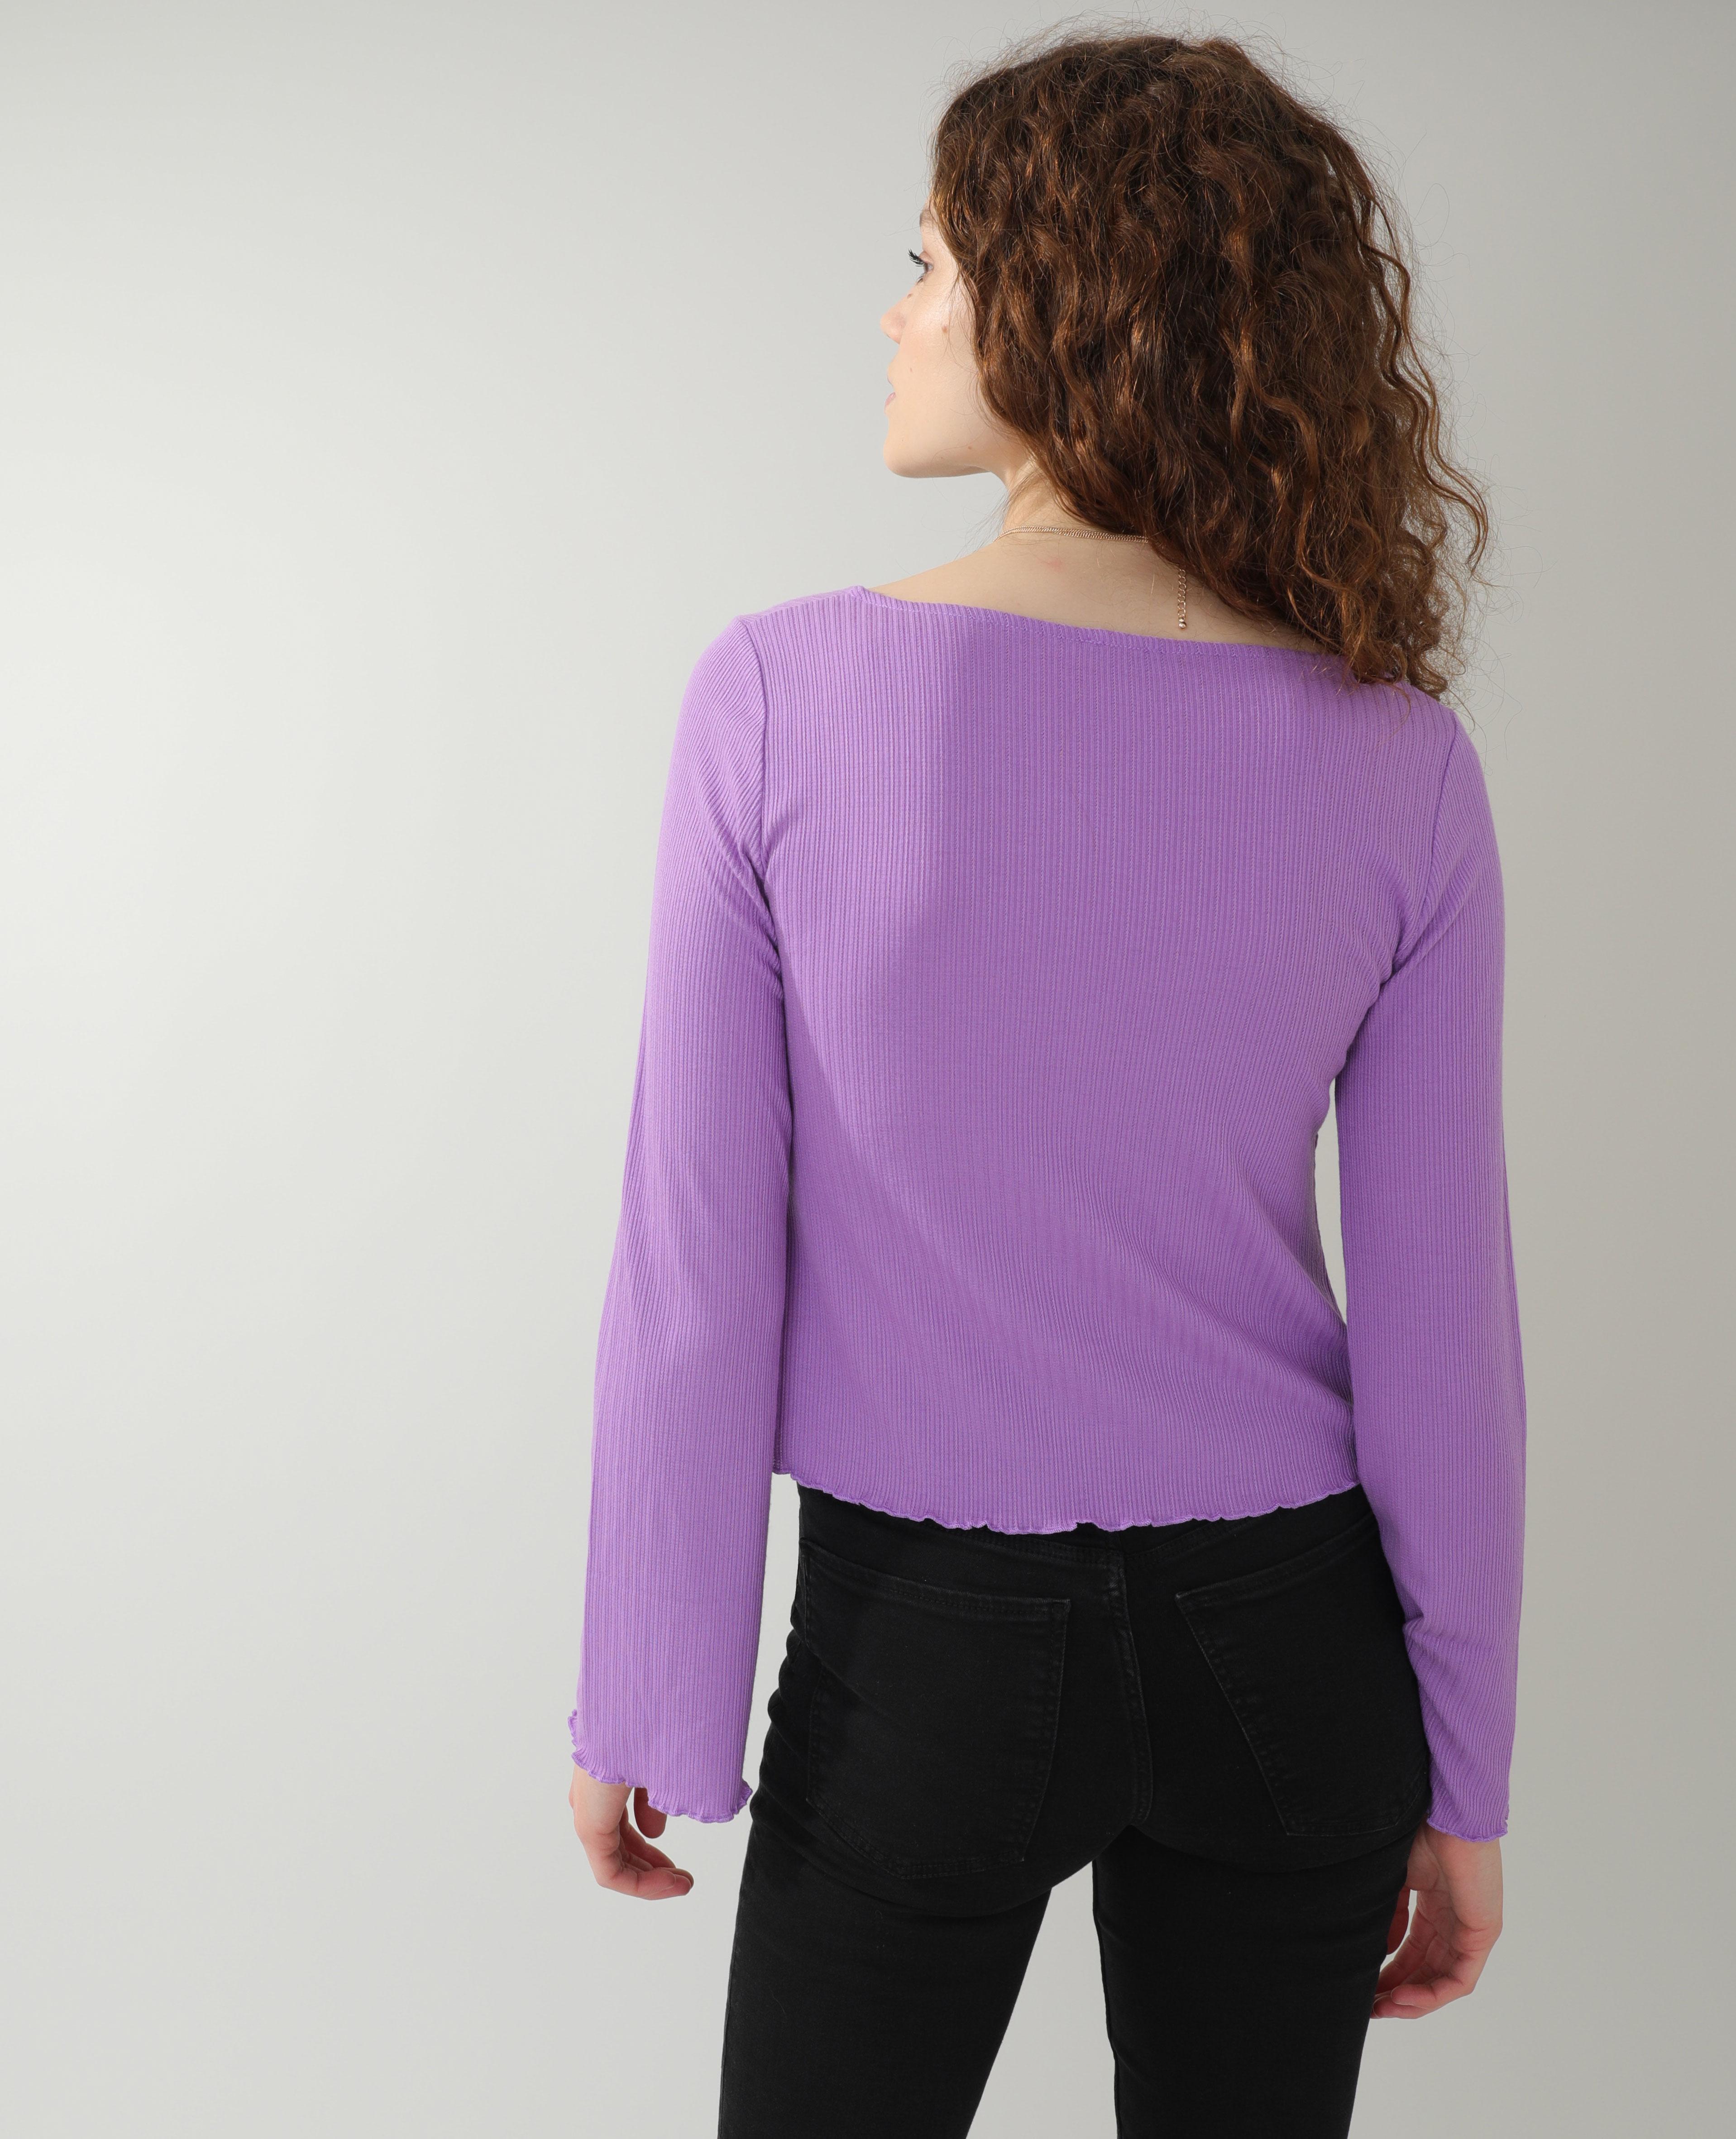 T-shirt violet - Pimkie